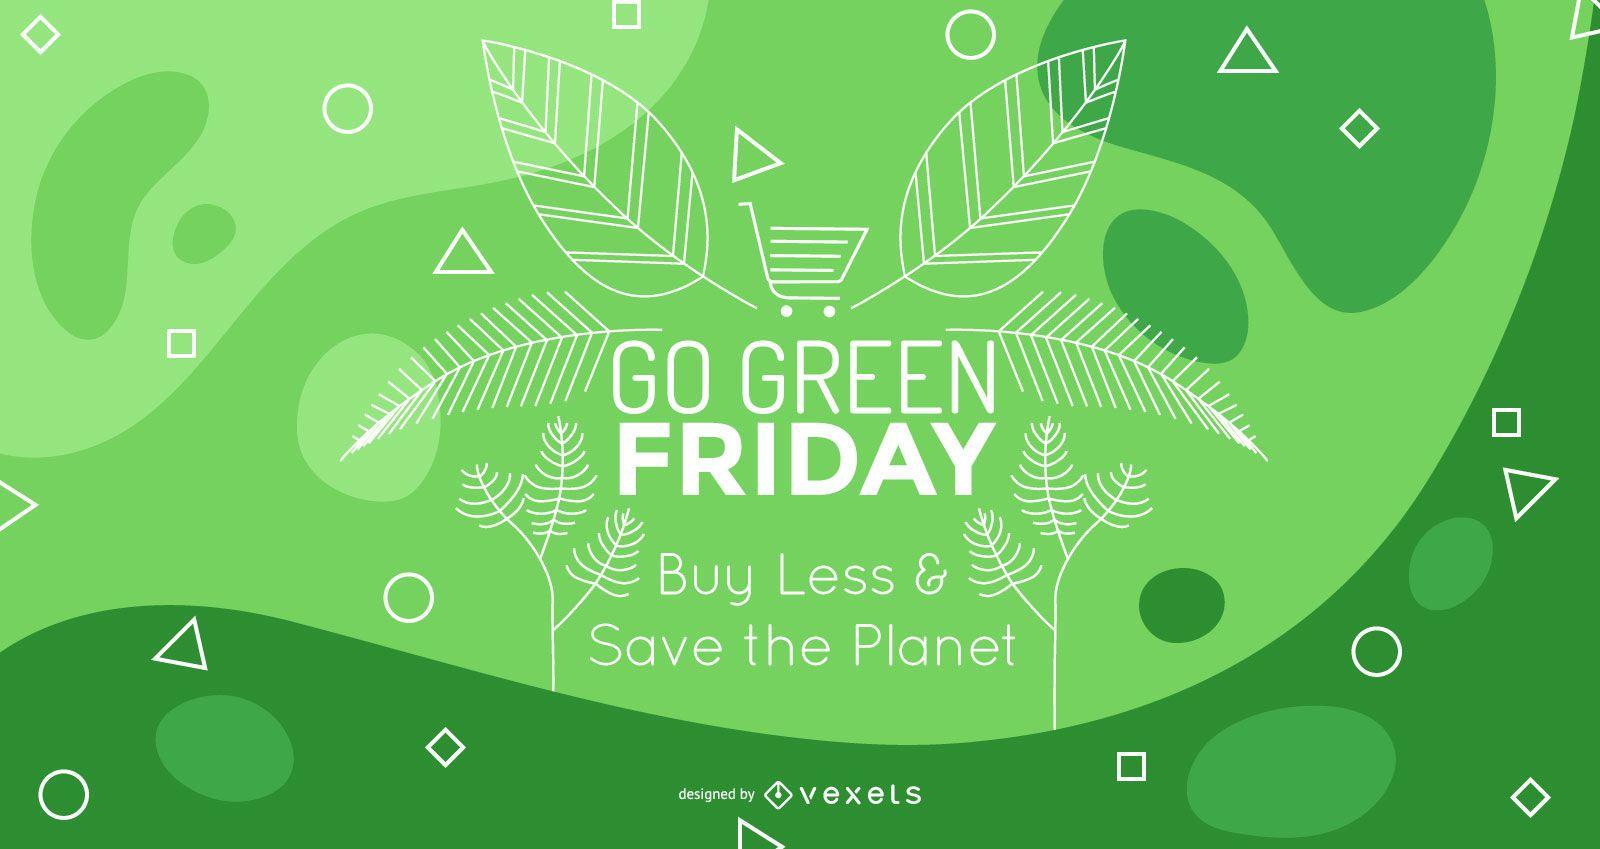 Green Friday Wallpaper Editable Design